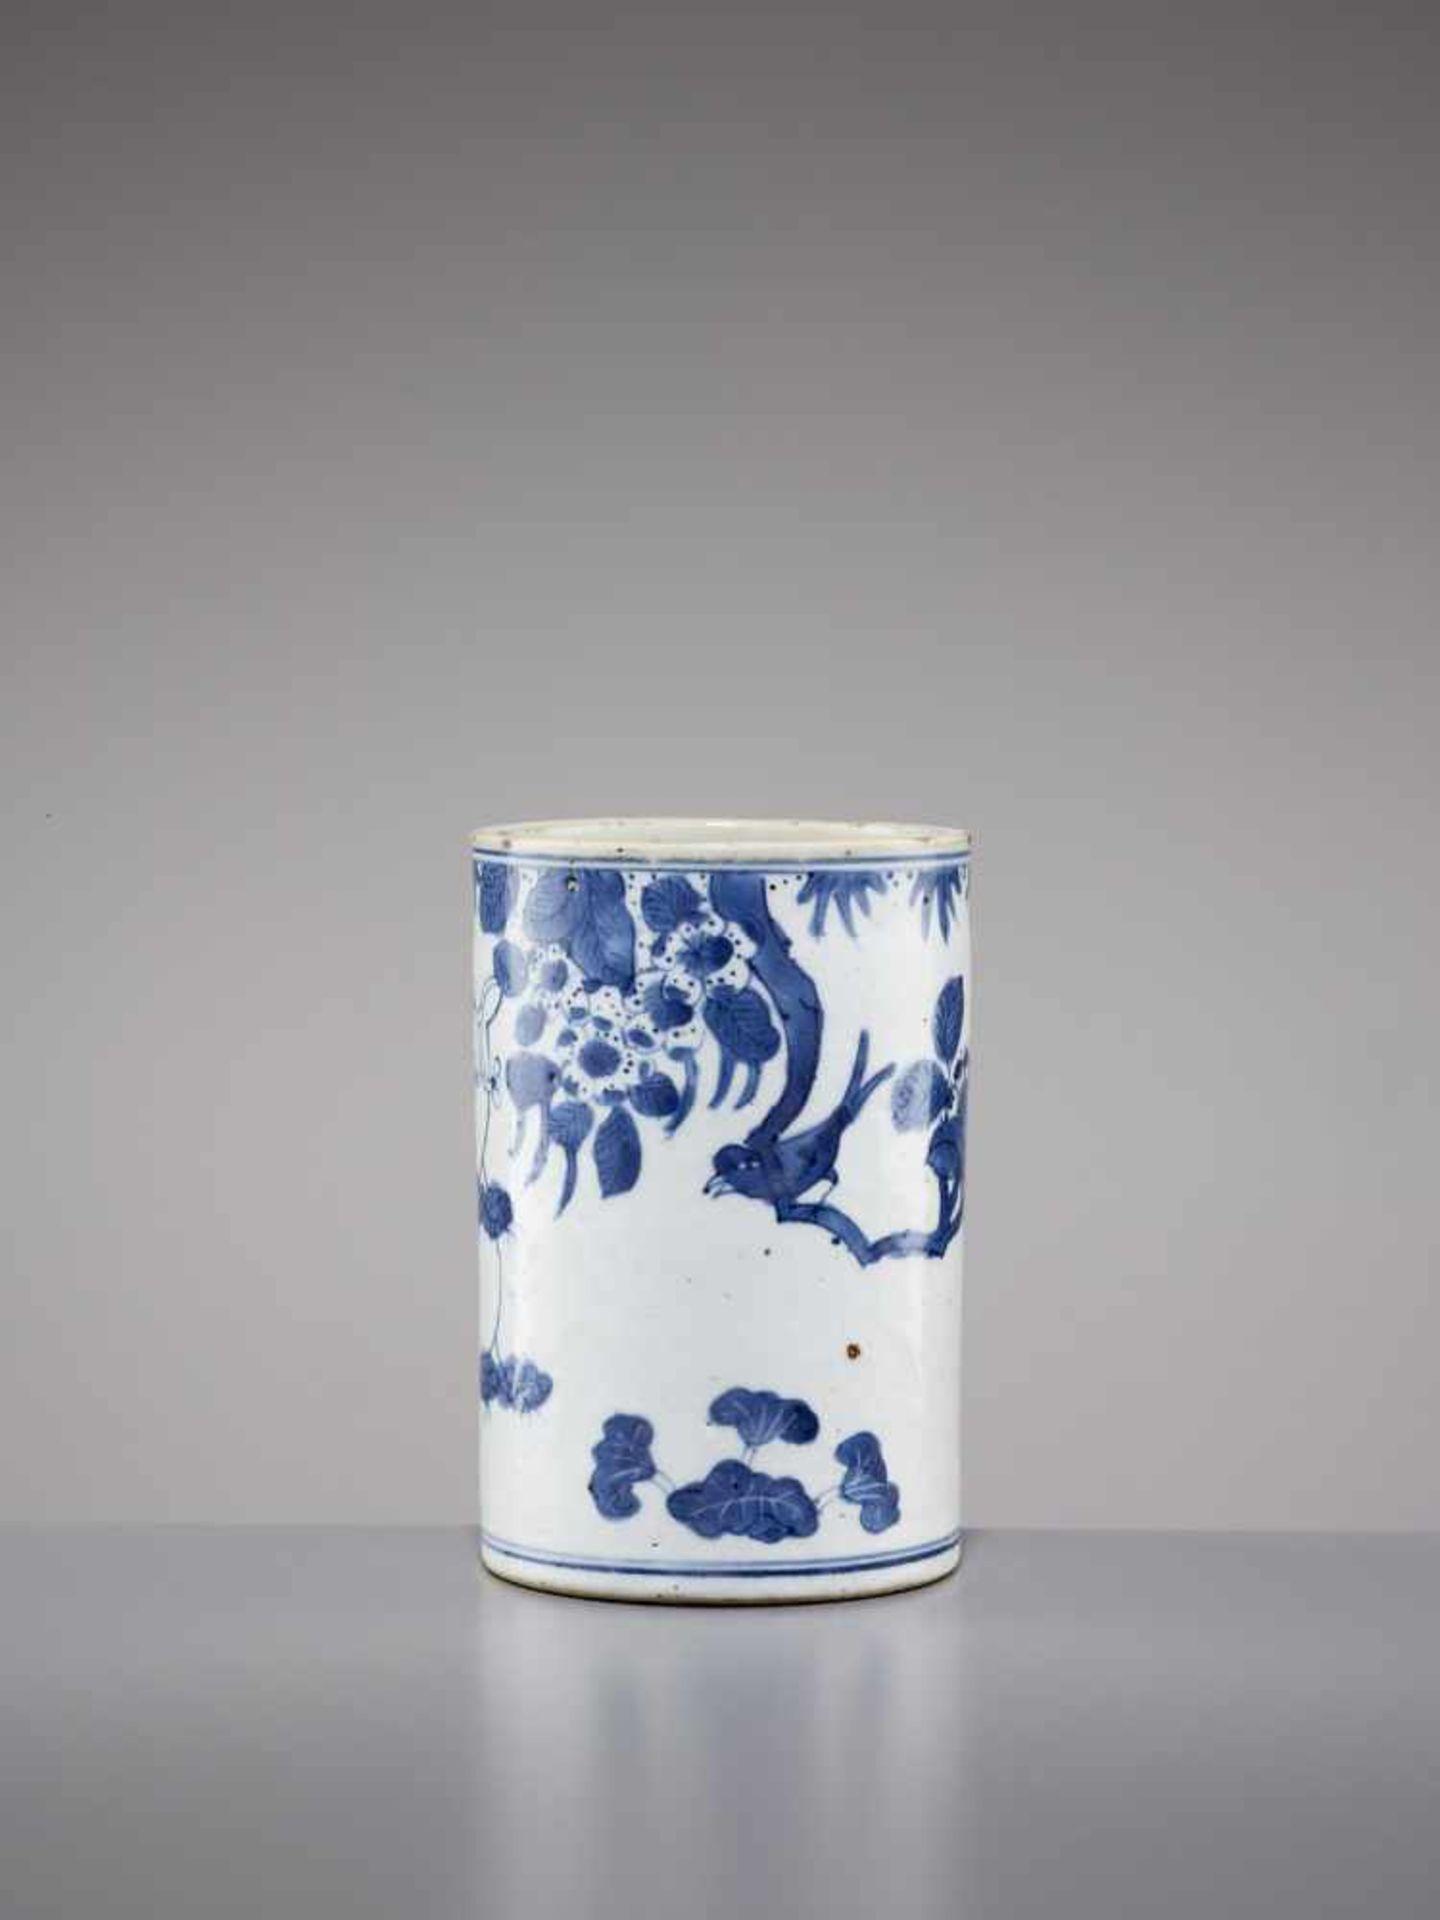 Los 442 - A TRANSITIONAL BLUE & WHITE BITONG, QING